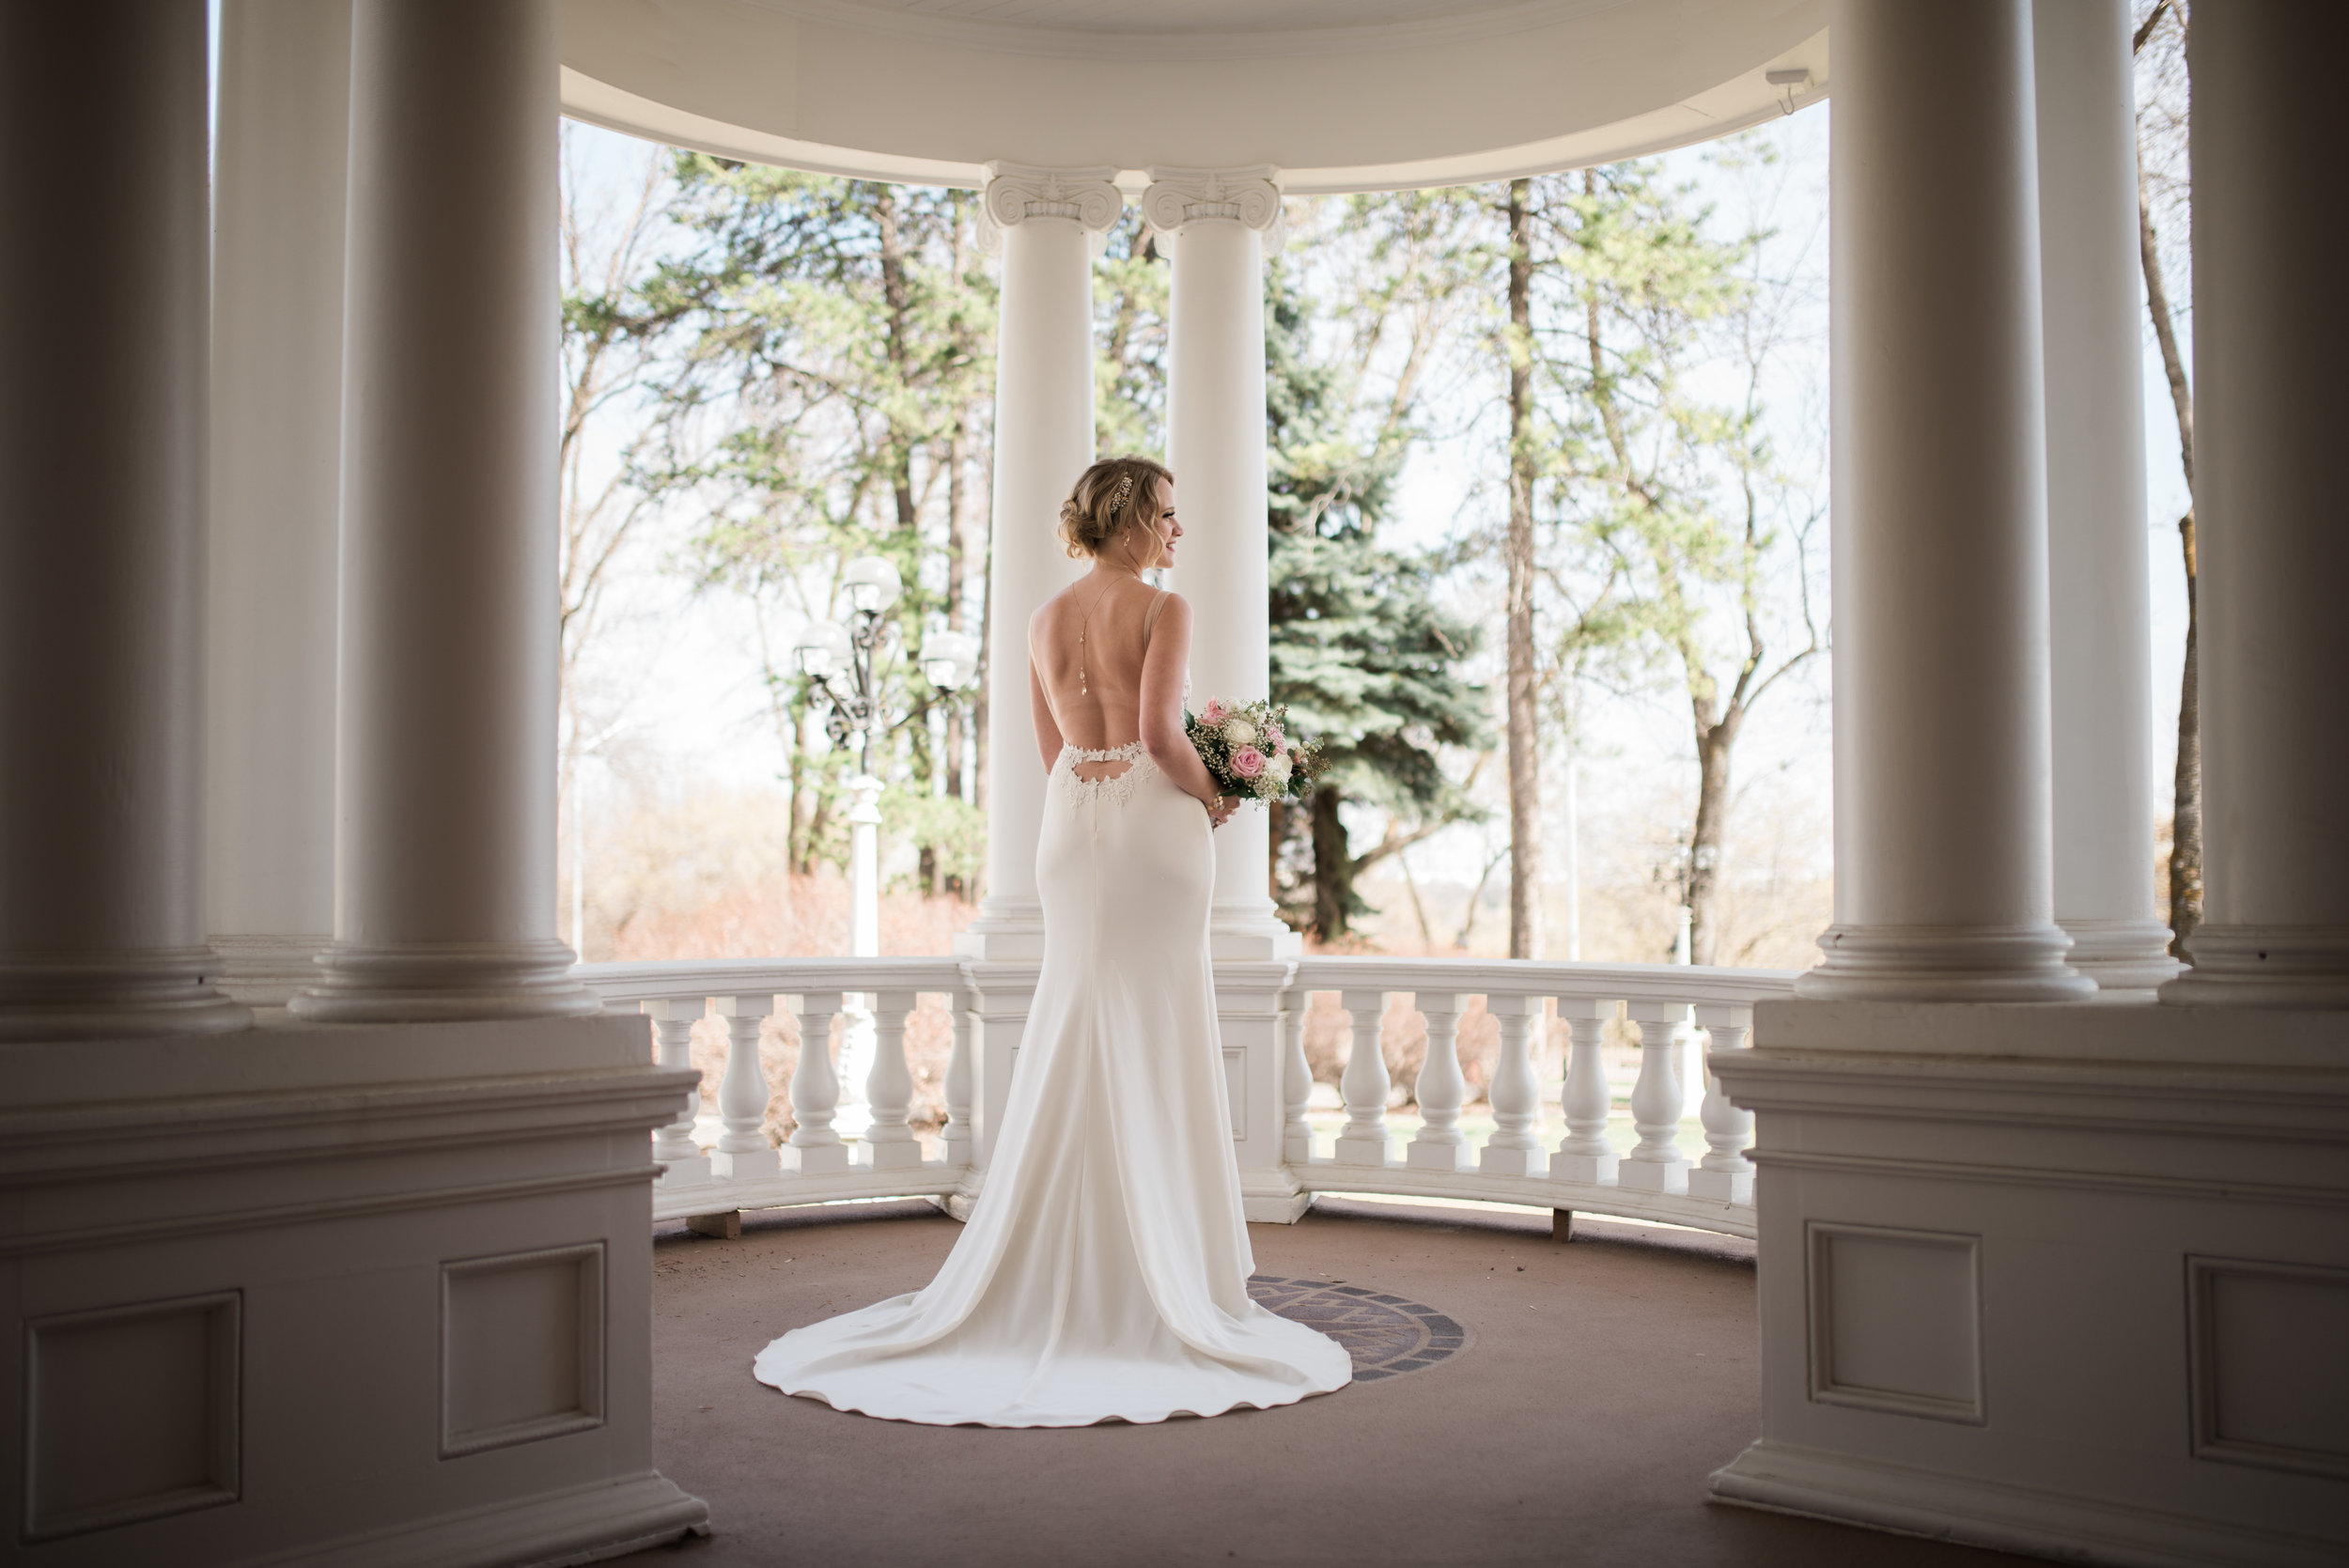 Ali Samantha Wedding 1278.jpg